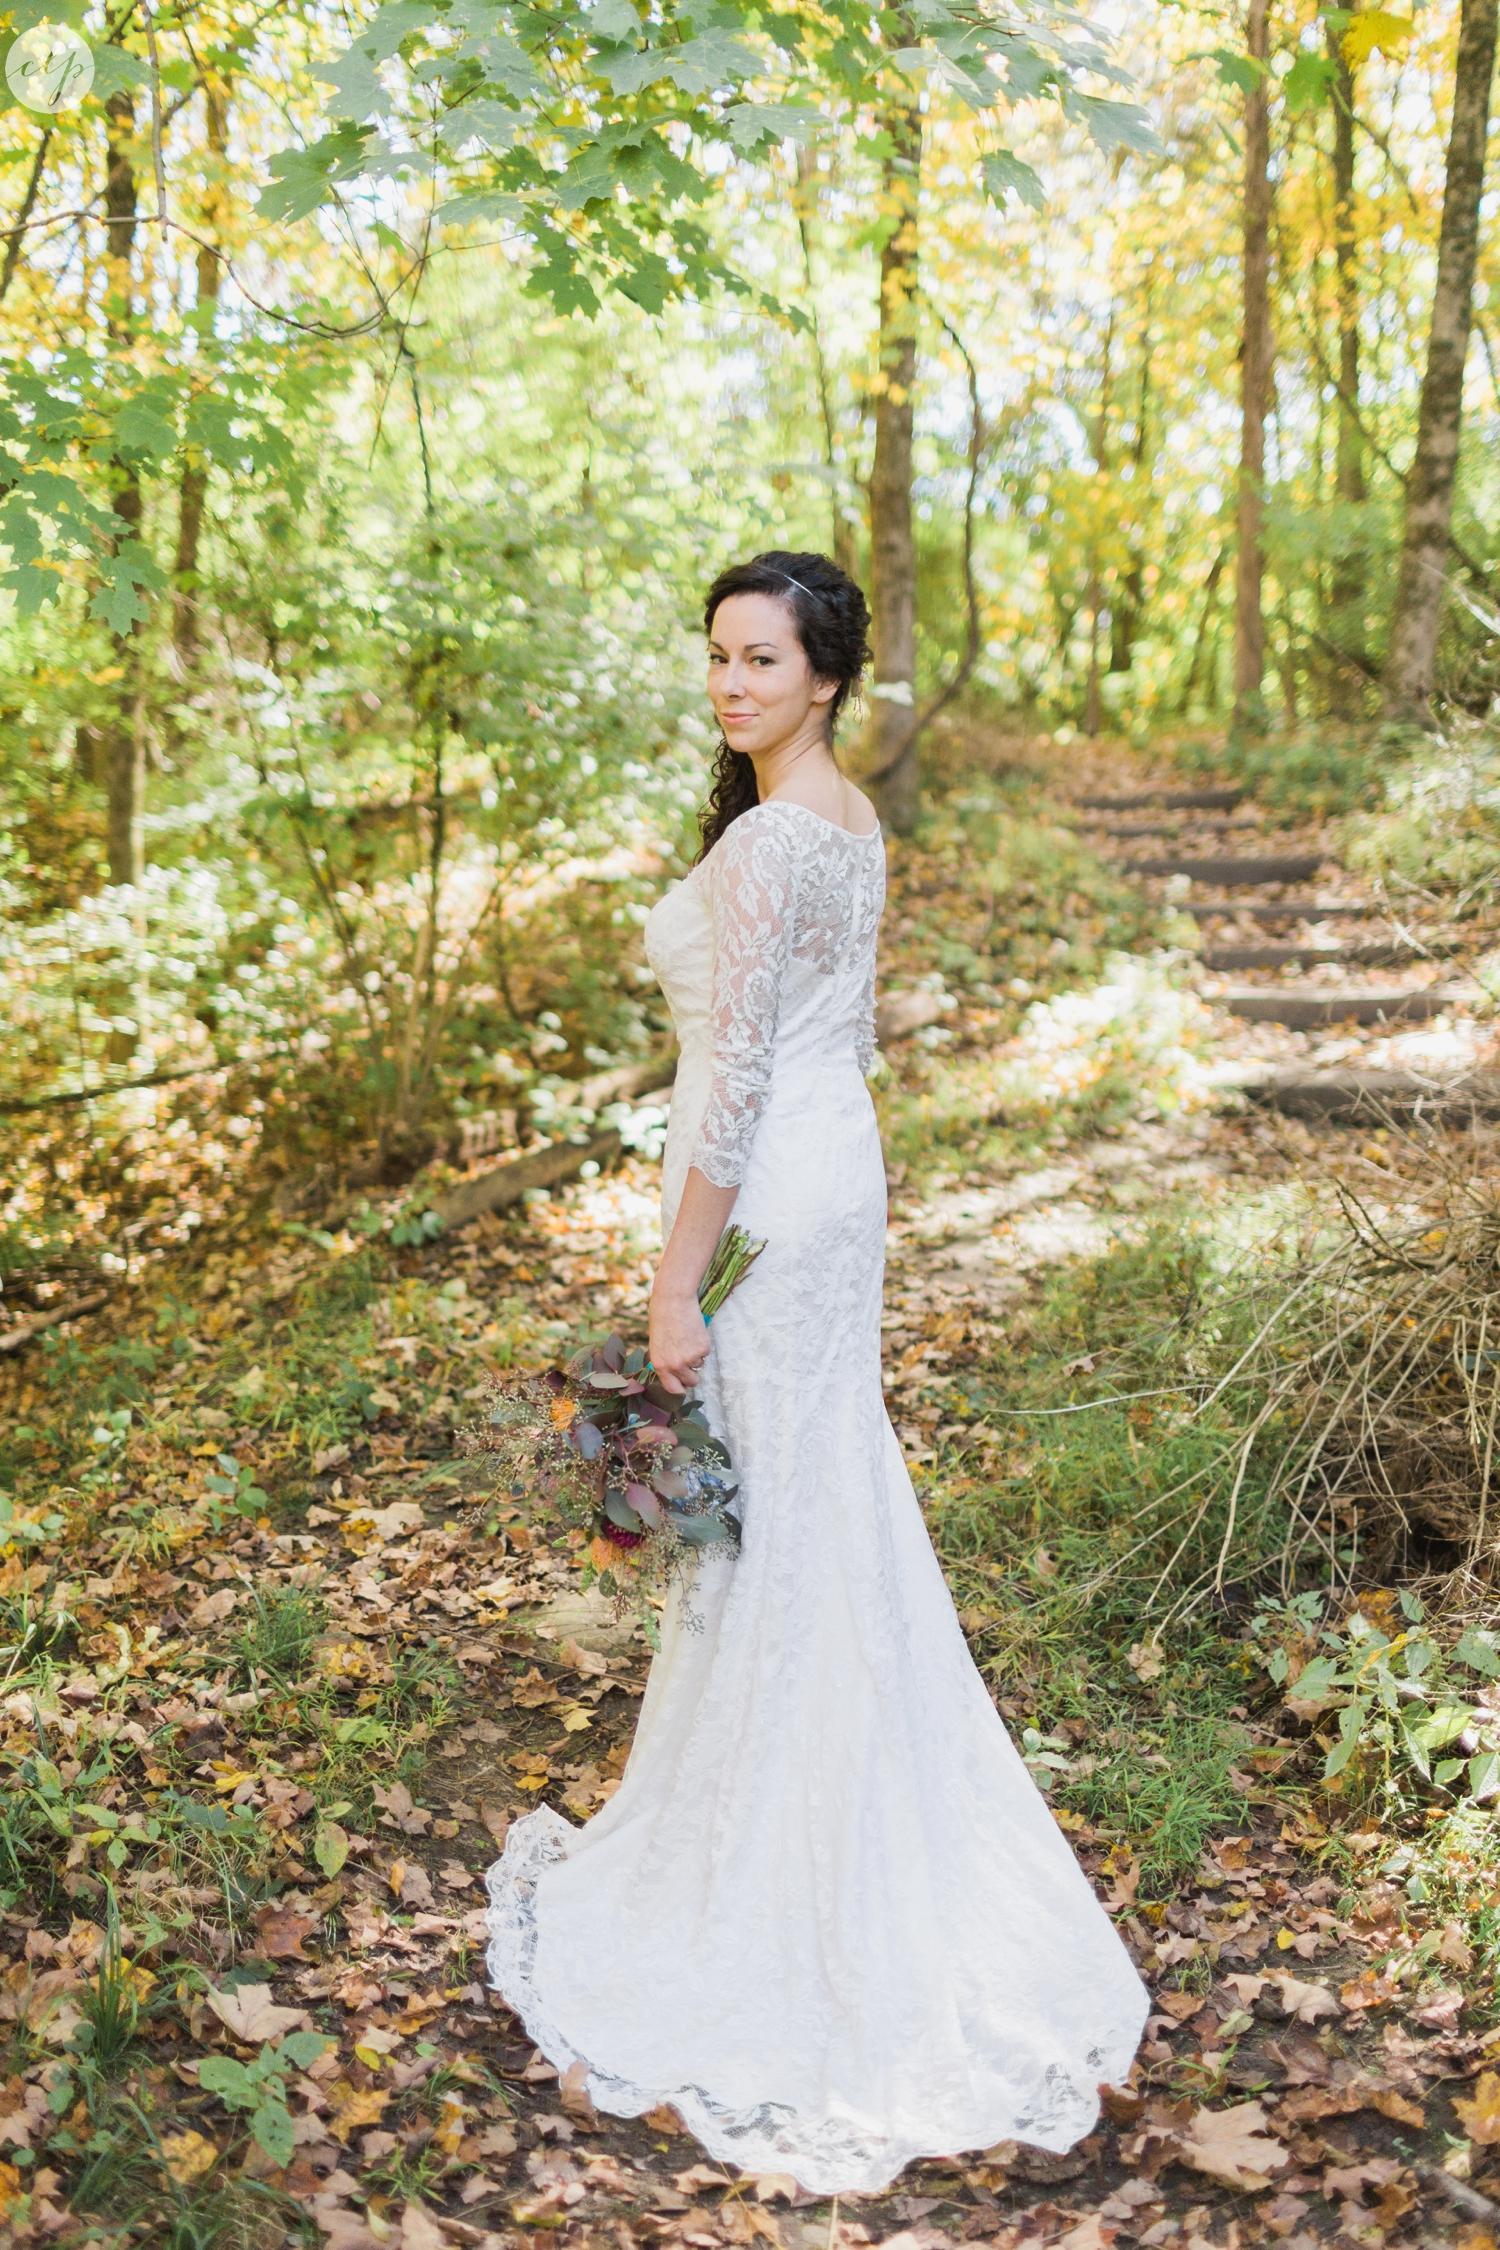 Outdoor-Wedding-in-the-Woods-Photography_4187.jpg